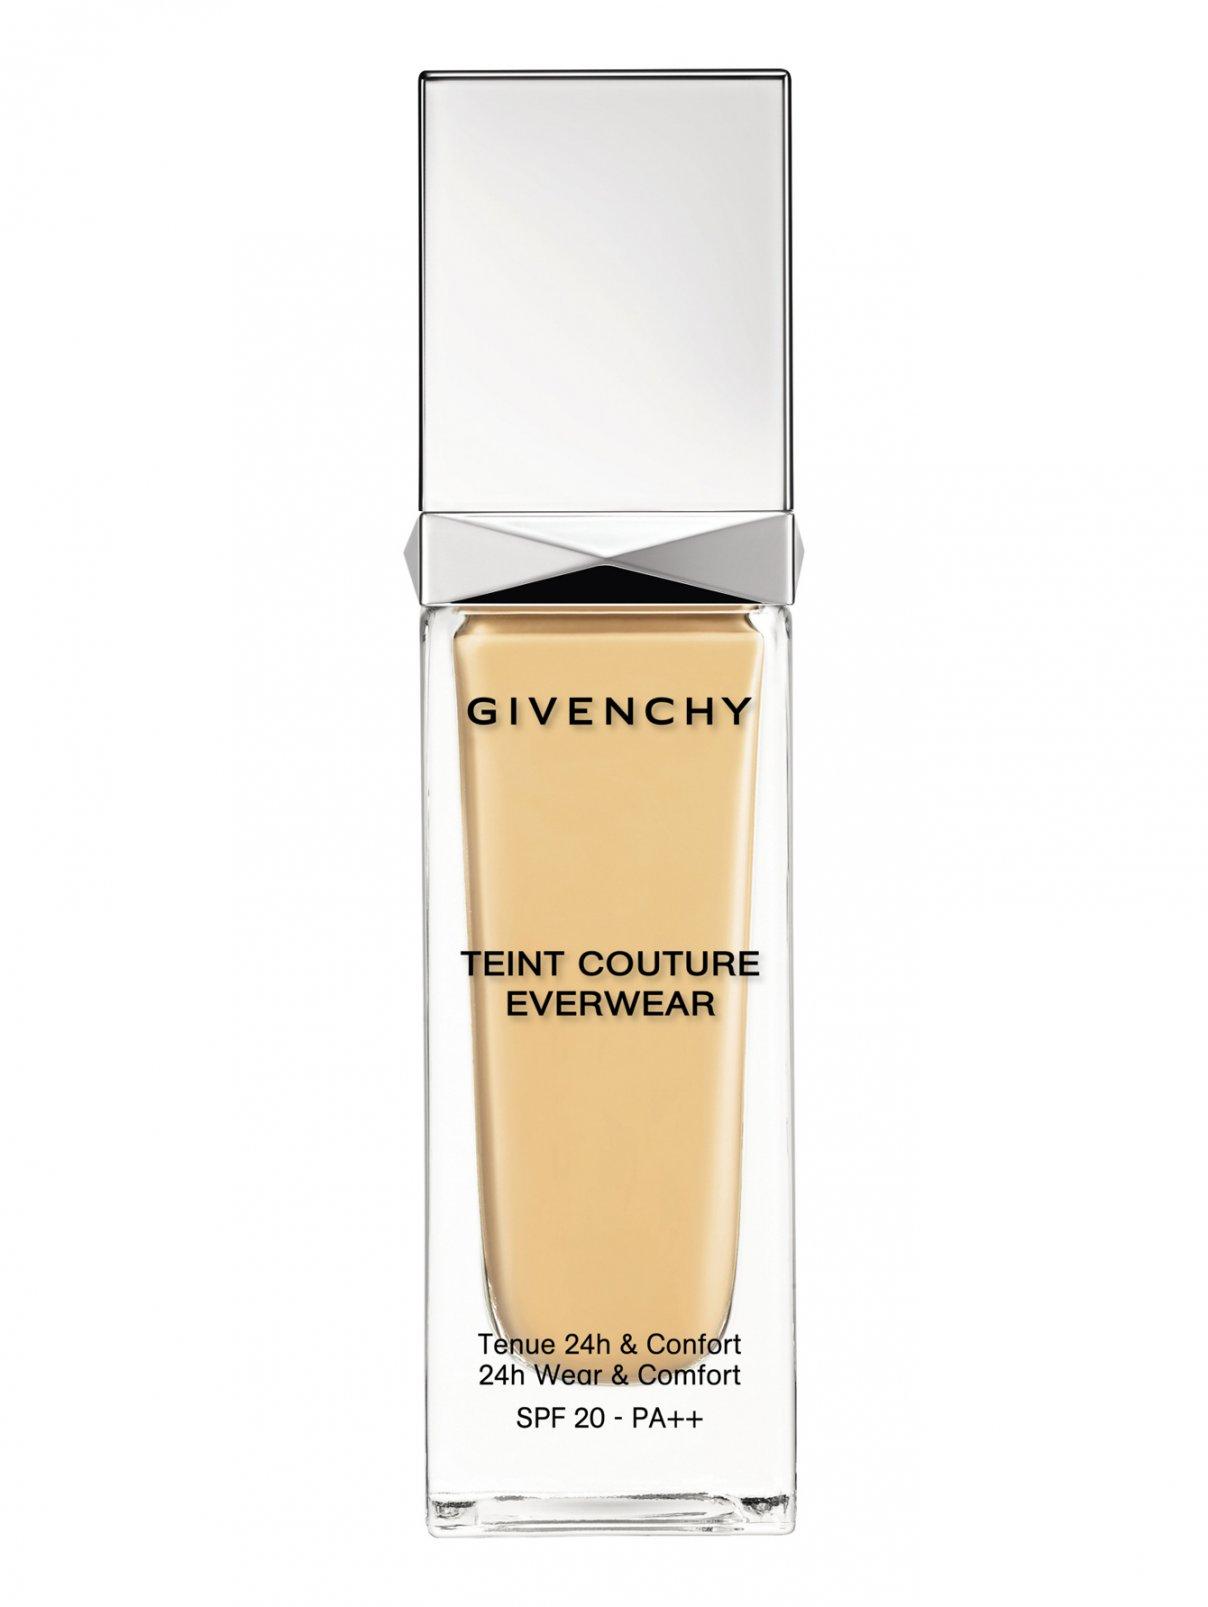 Тональный флюид TEINT COUTURE EVERWEAR SPF20- PA++, Y200, 30 мл Givenchy  –  Общий вид